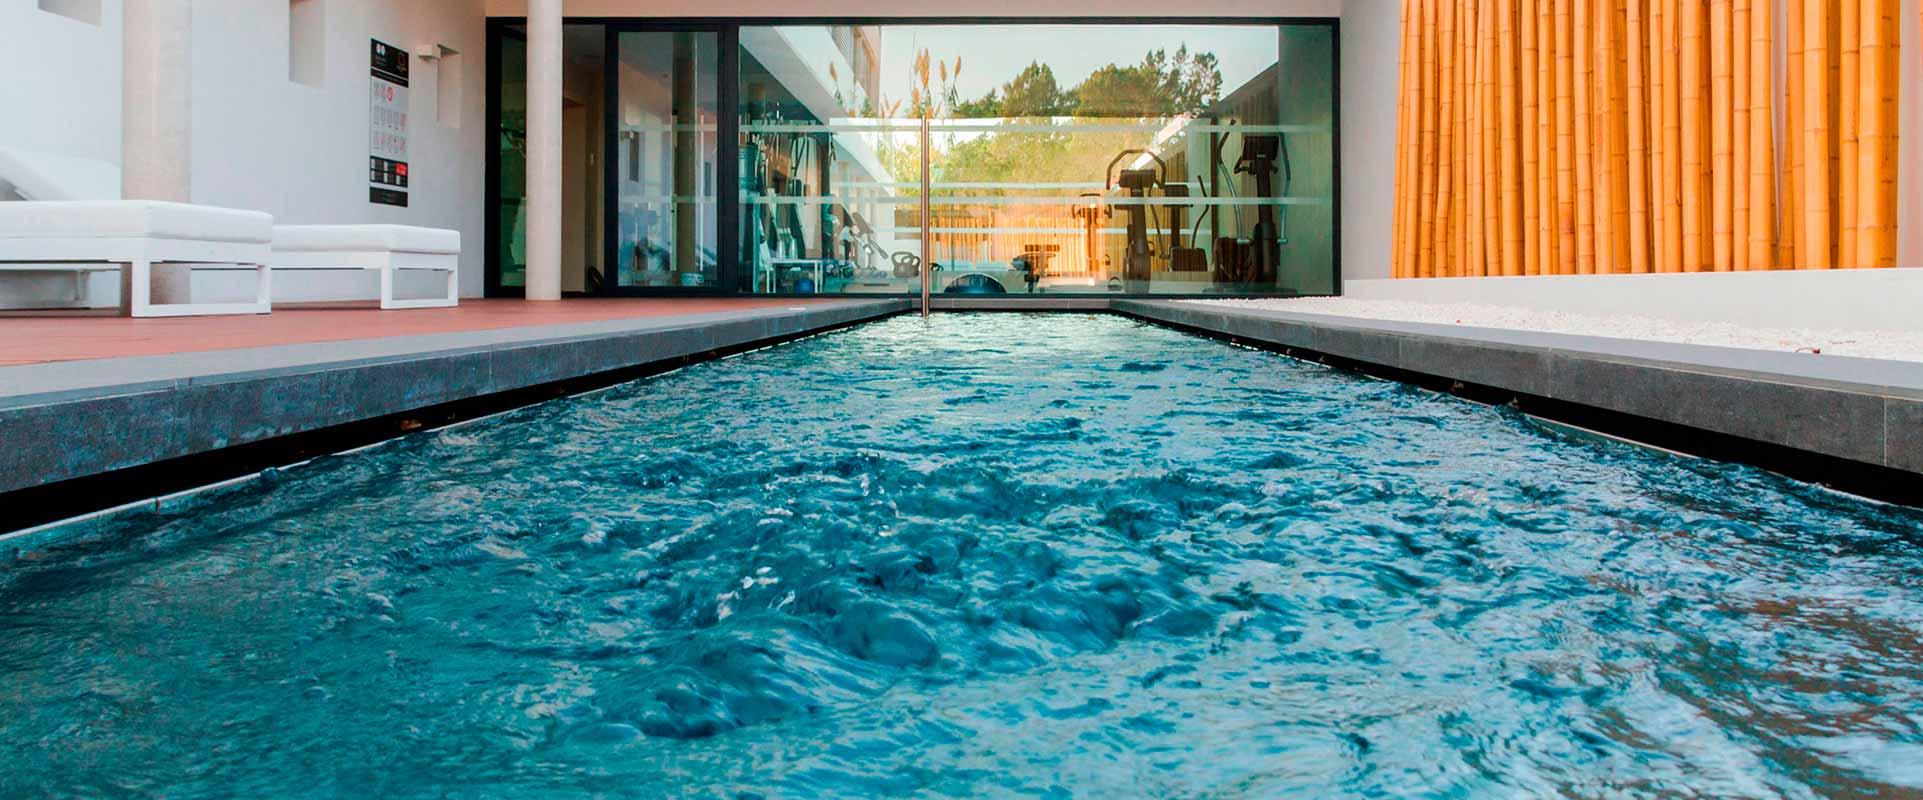 Hotel Cala Saona Formentera - Spa